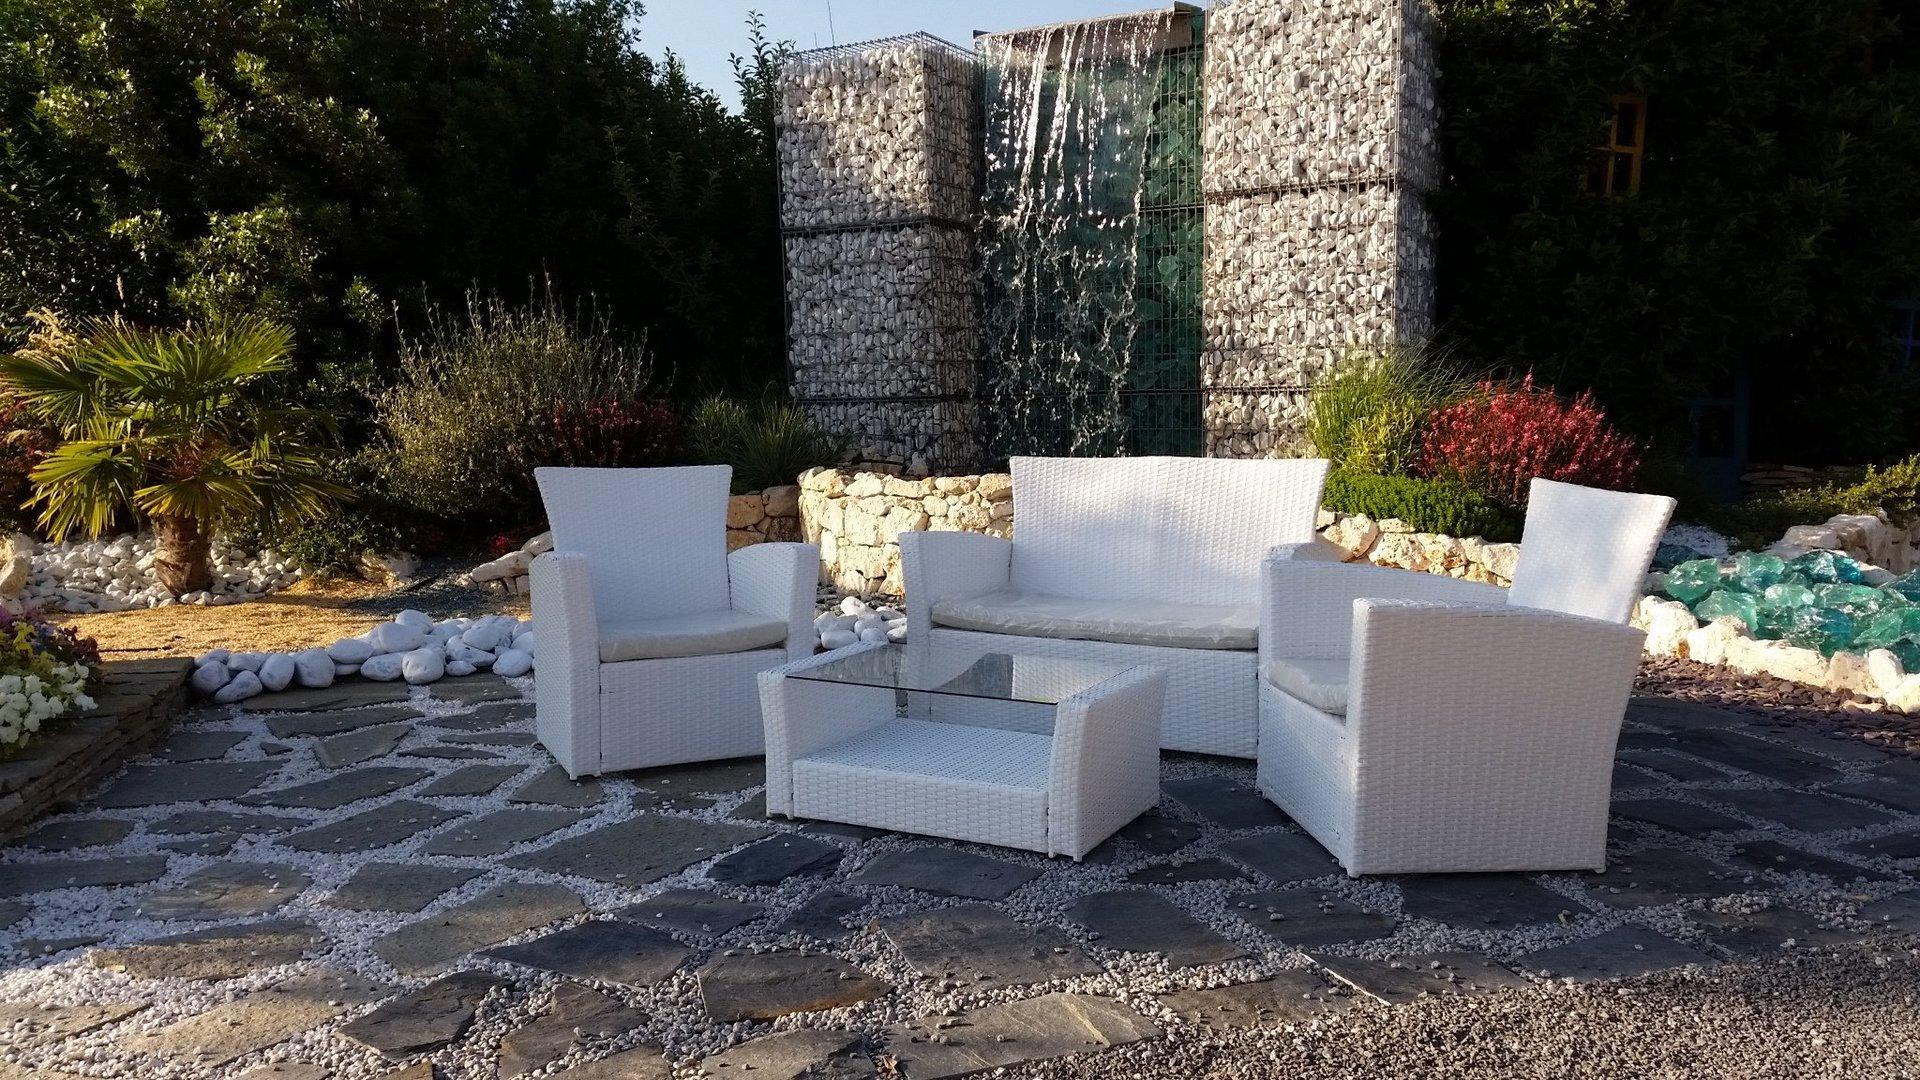 Arredo giardino e esterno bellizzi sa montella prisma for Arredo giardino mestre